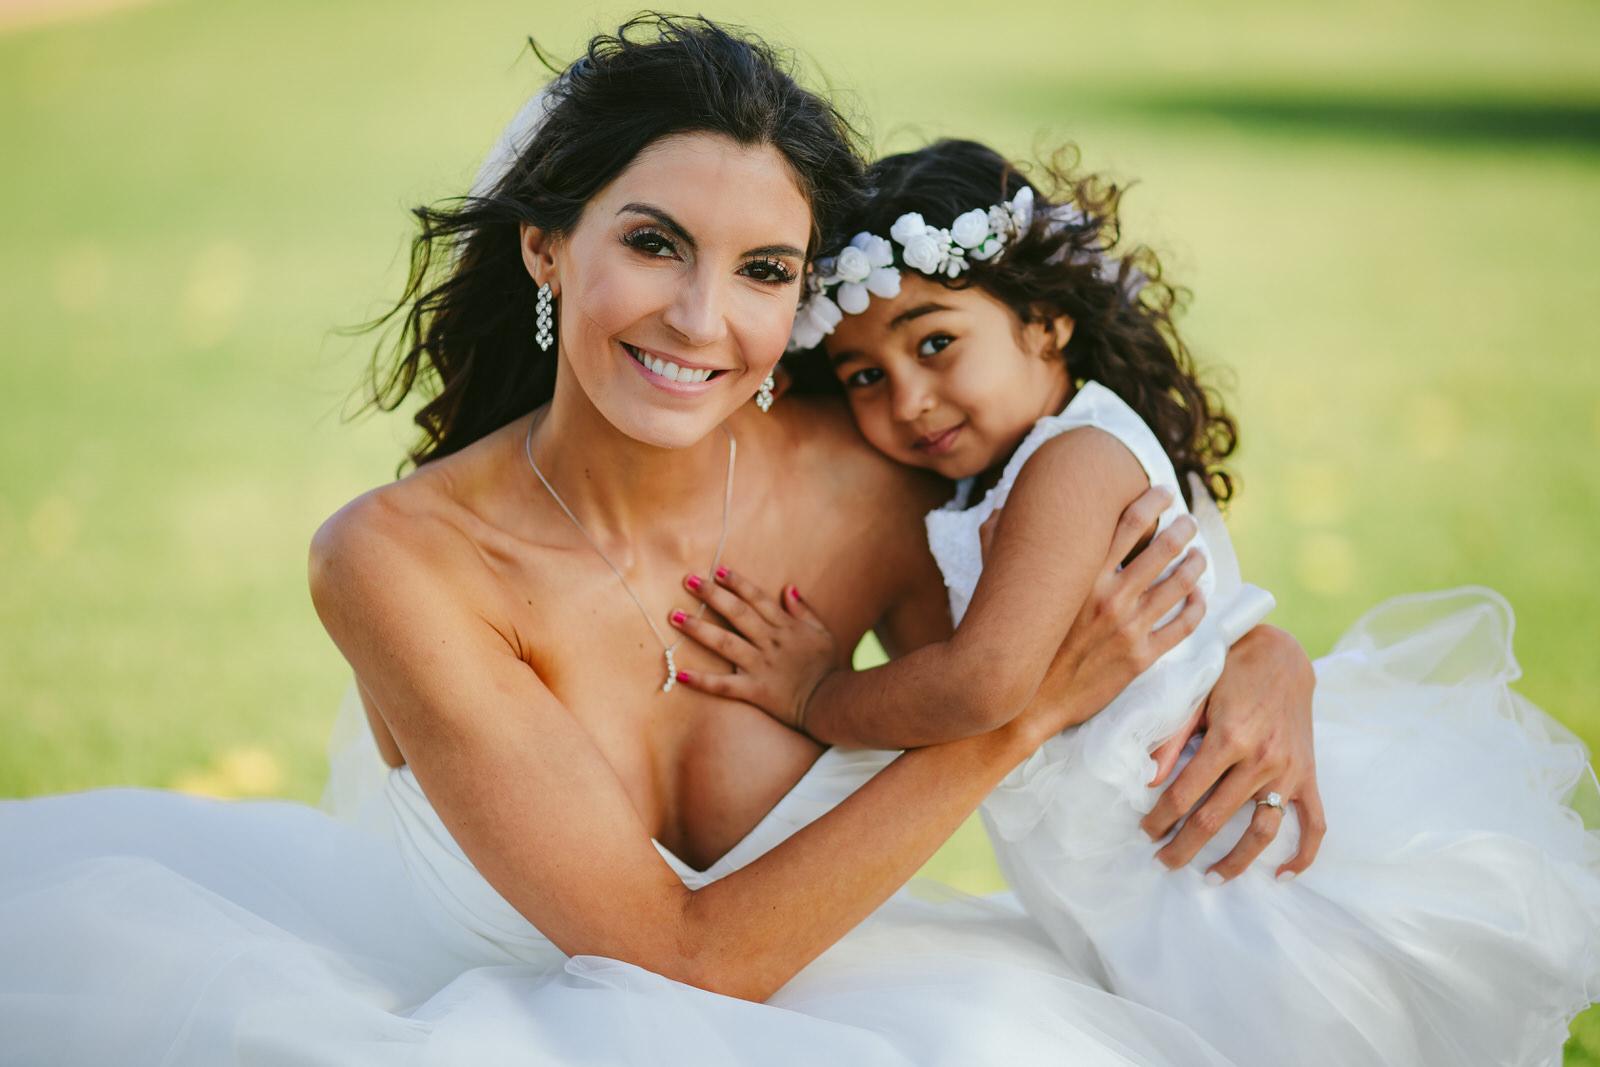 jensen_beach_wedding_bride_groom_portraits-9.jpg